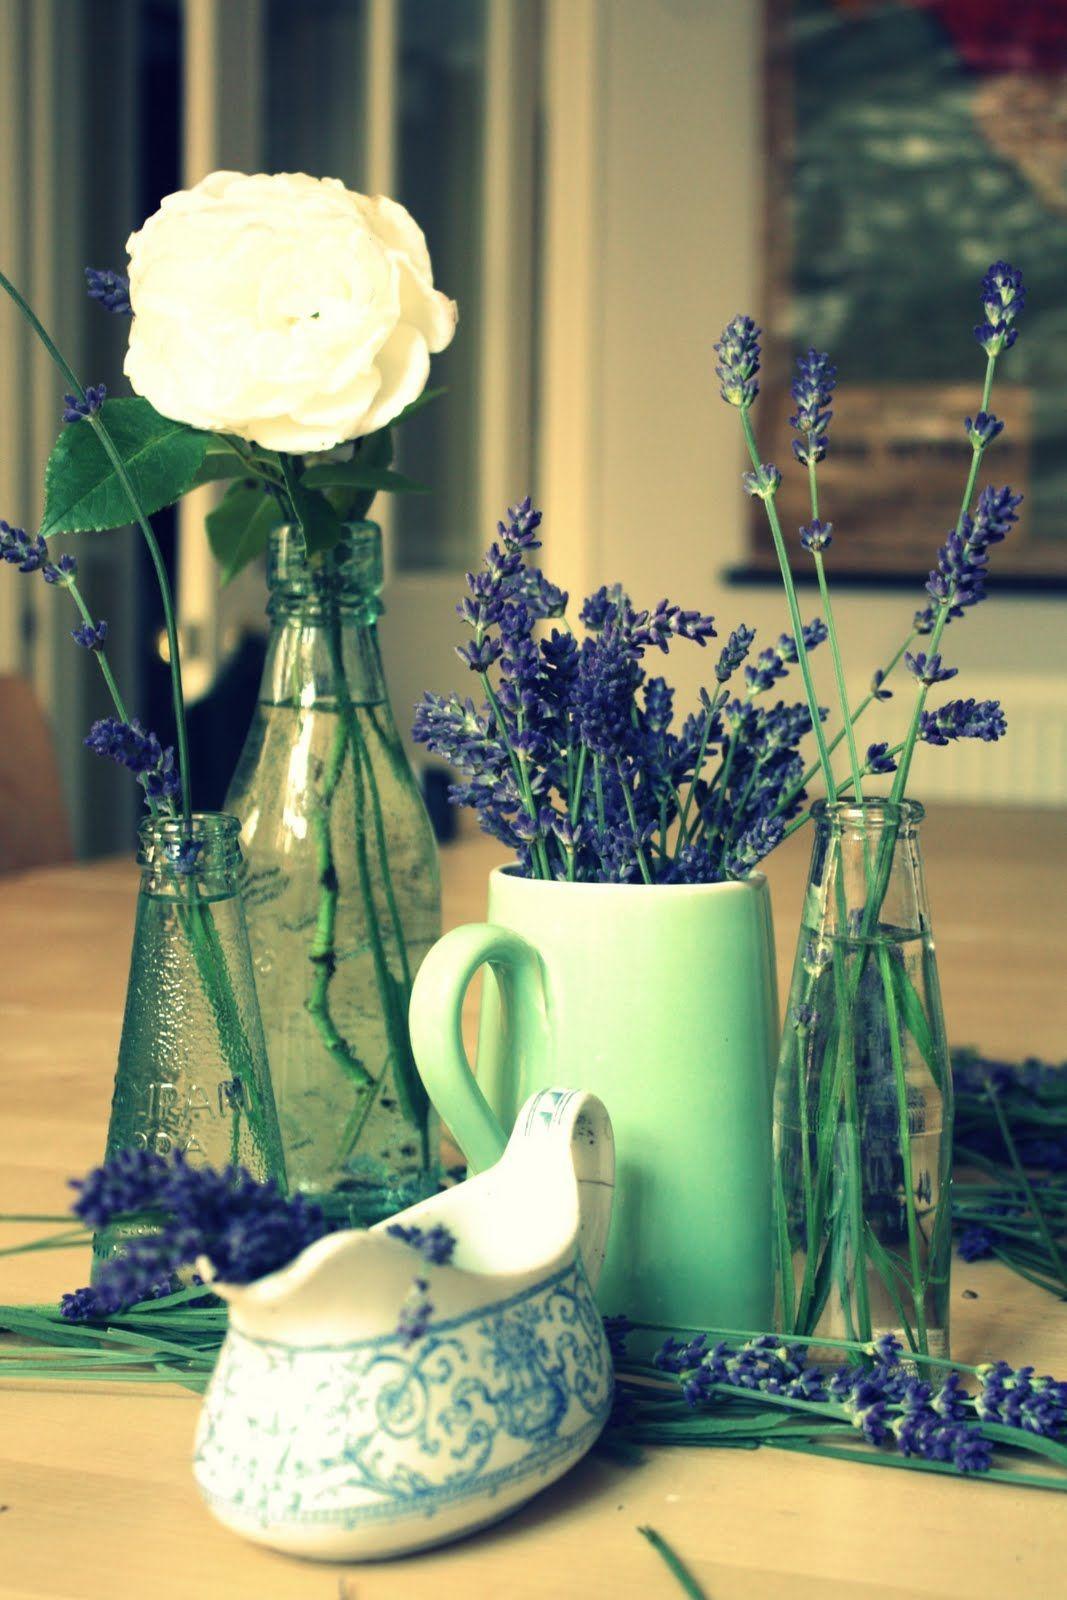 Fresh French Lavender